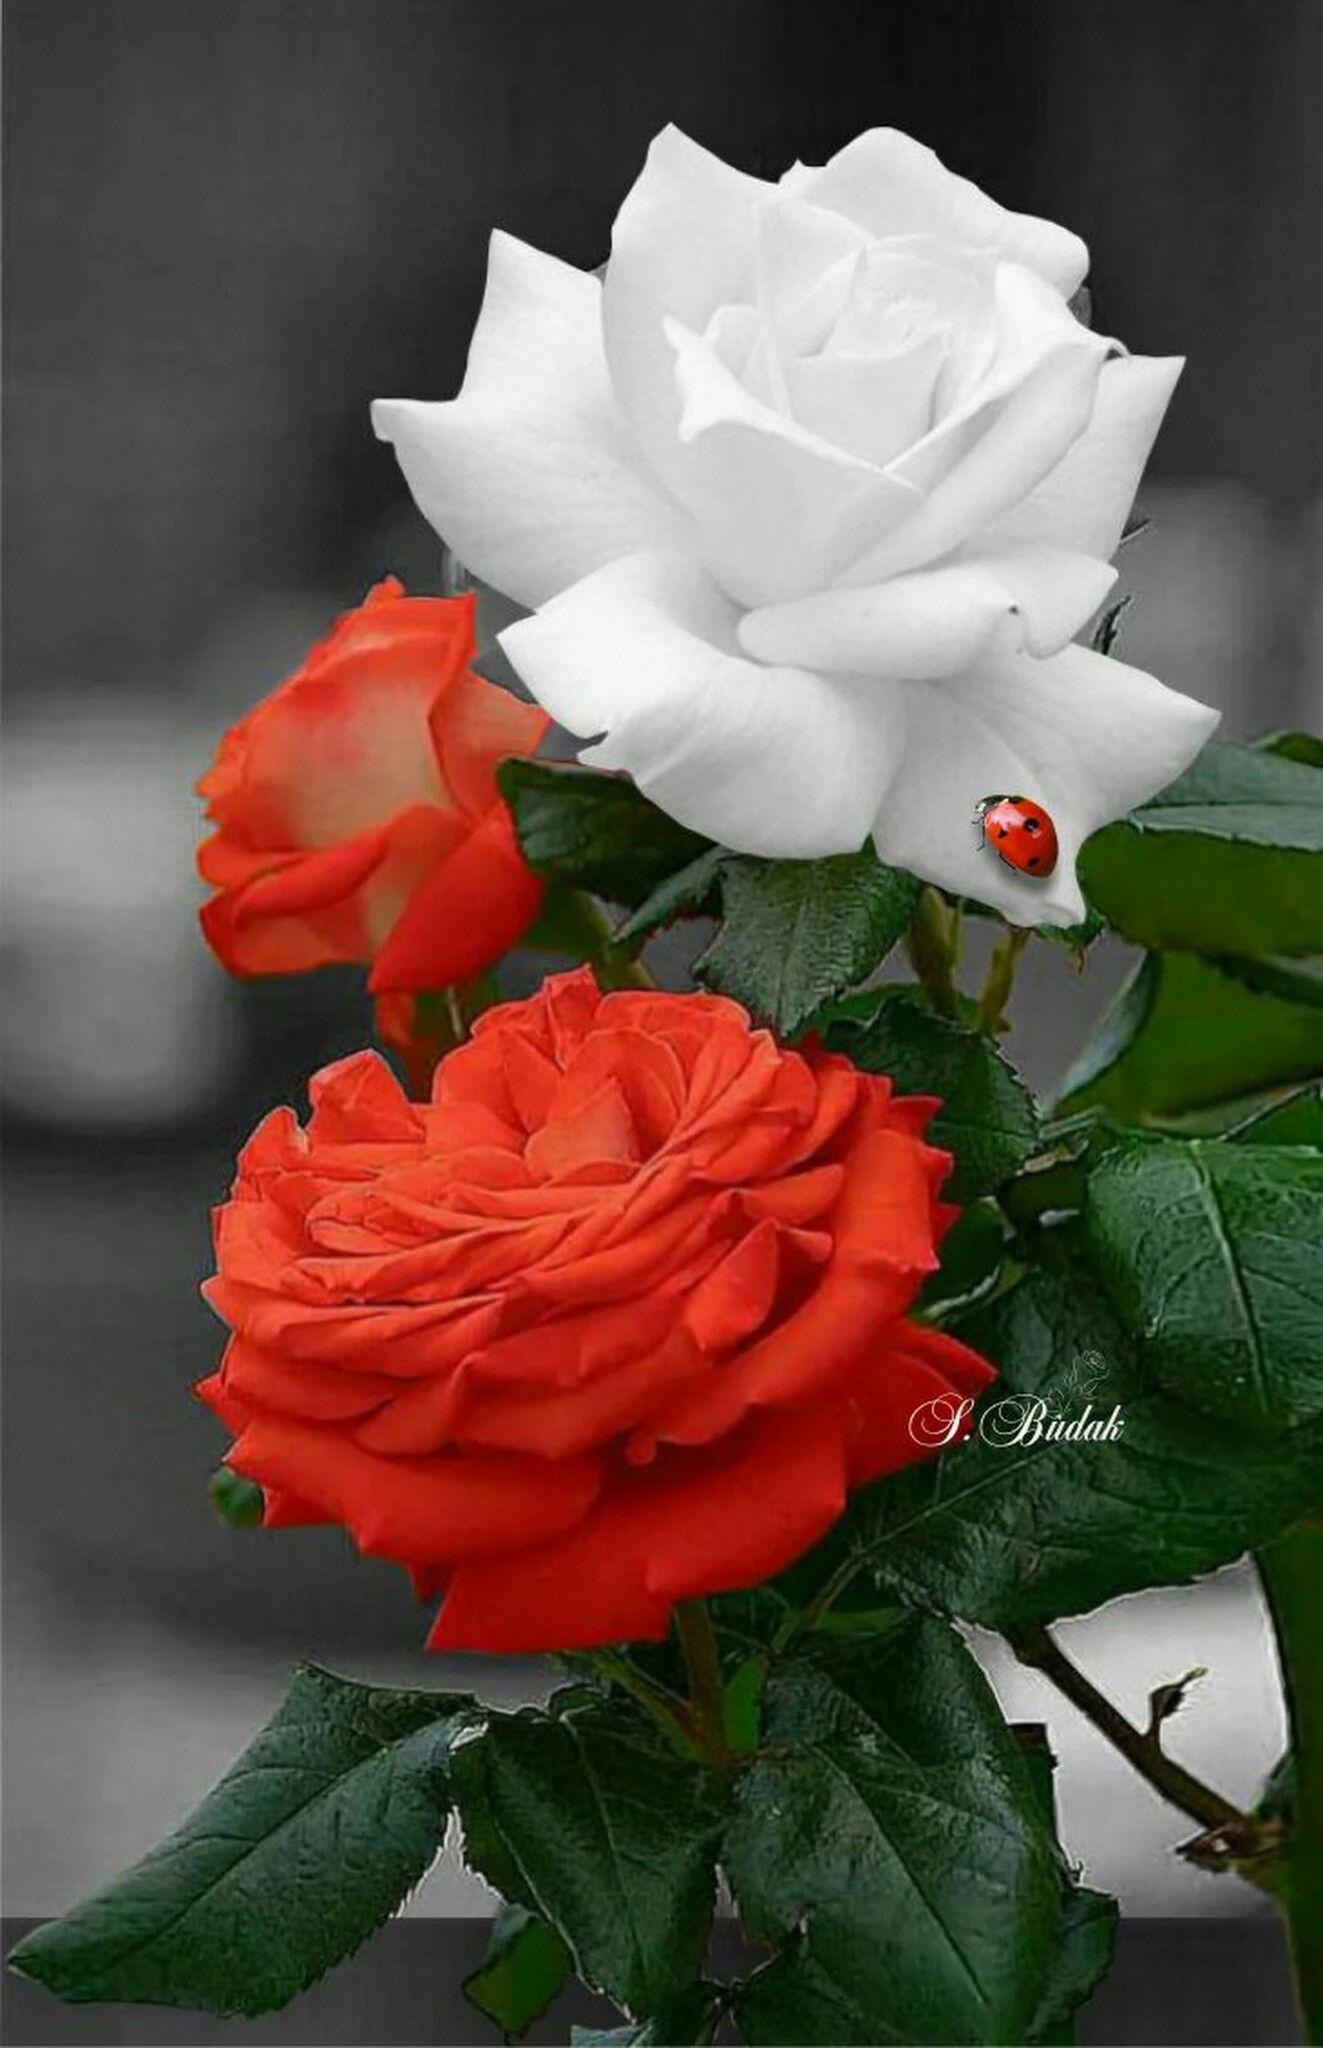 Rose Meravigliose, Giardino Di Fiori, Rose Rampicanti, Fotografia Di Fiori,  Natale, Rose Rosse, Coccinelle, Queen, Foglie